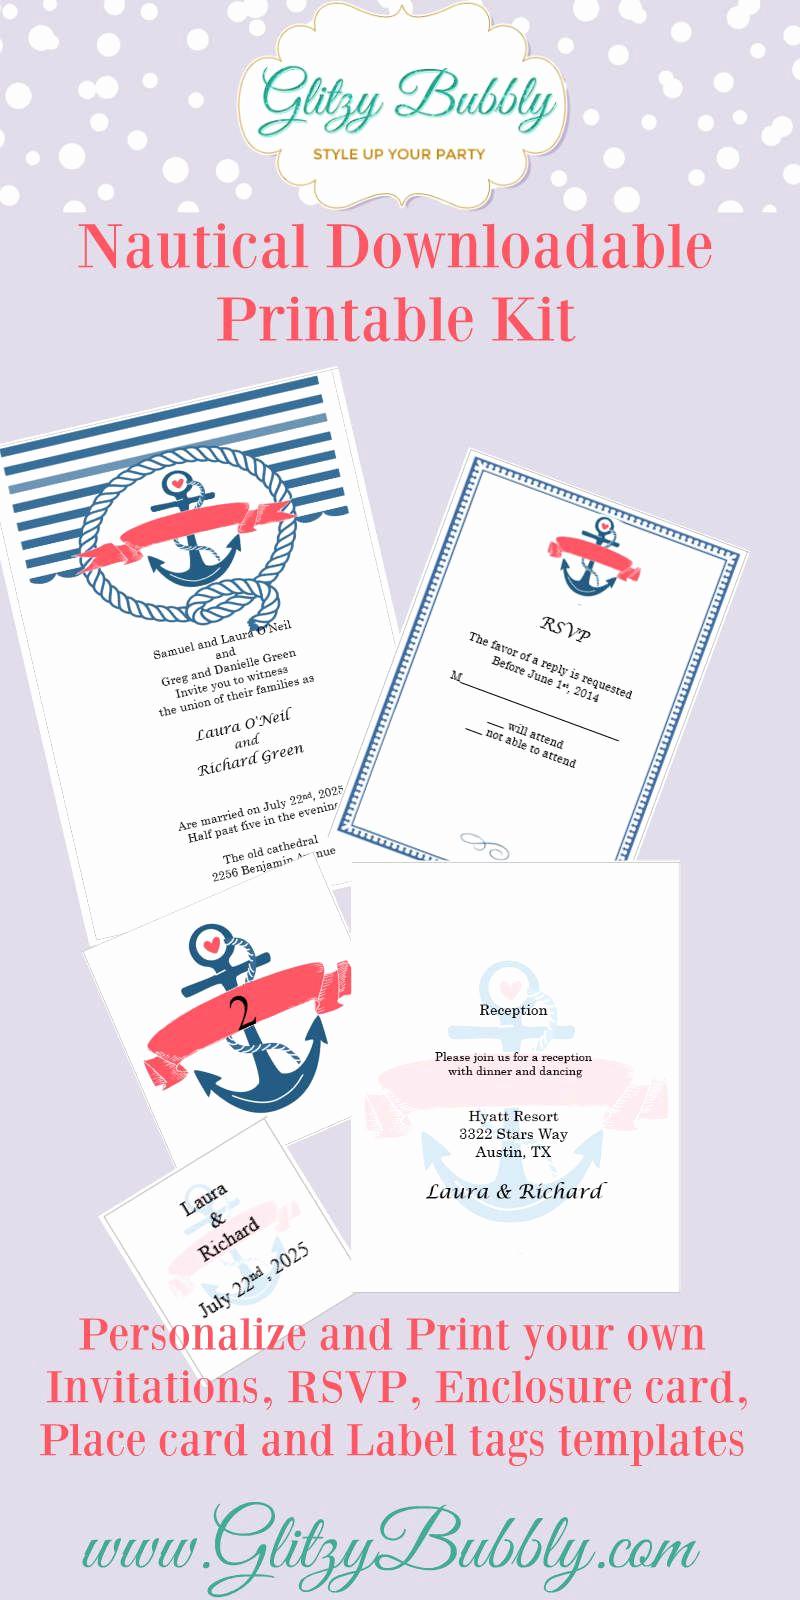 Free Nautical Invitation Templates Inspirational Download Your Free Nautical Wedding Invitation Template at